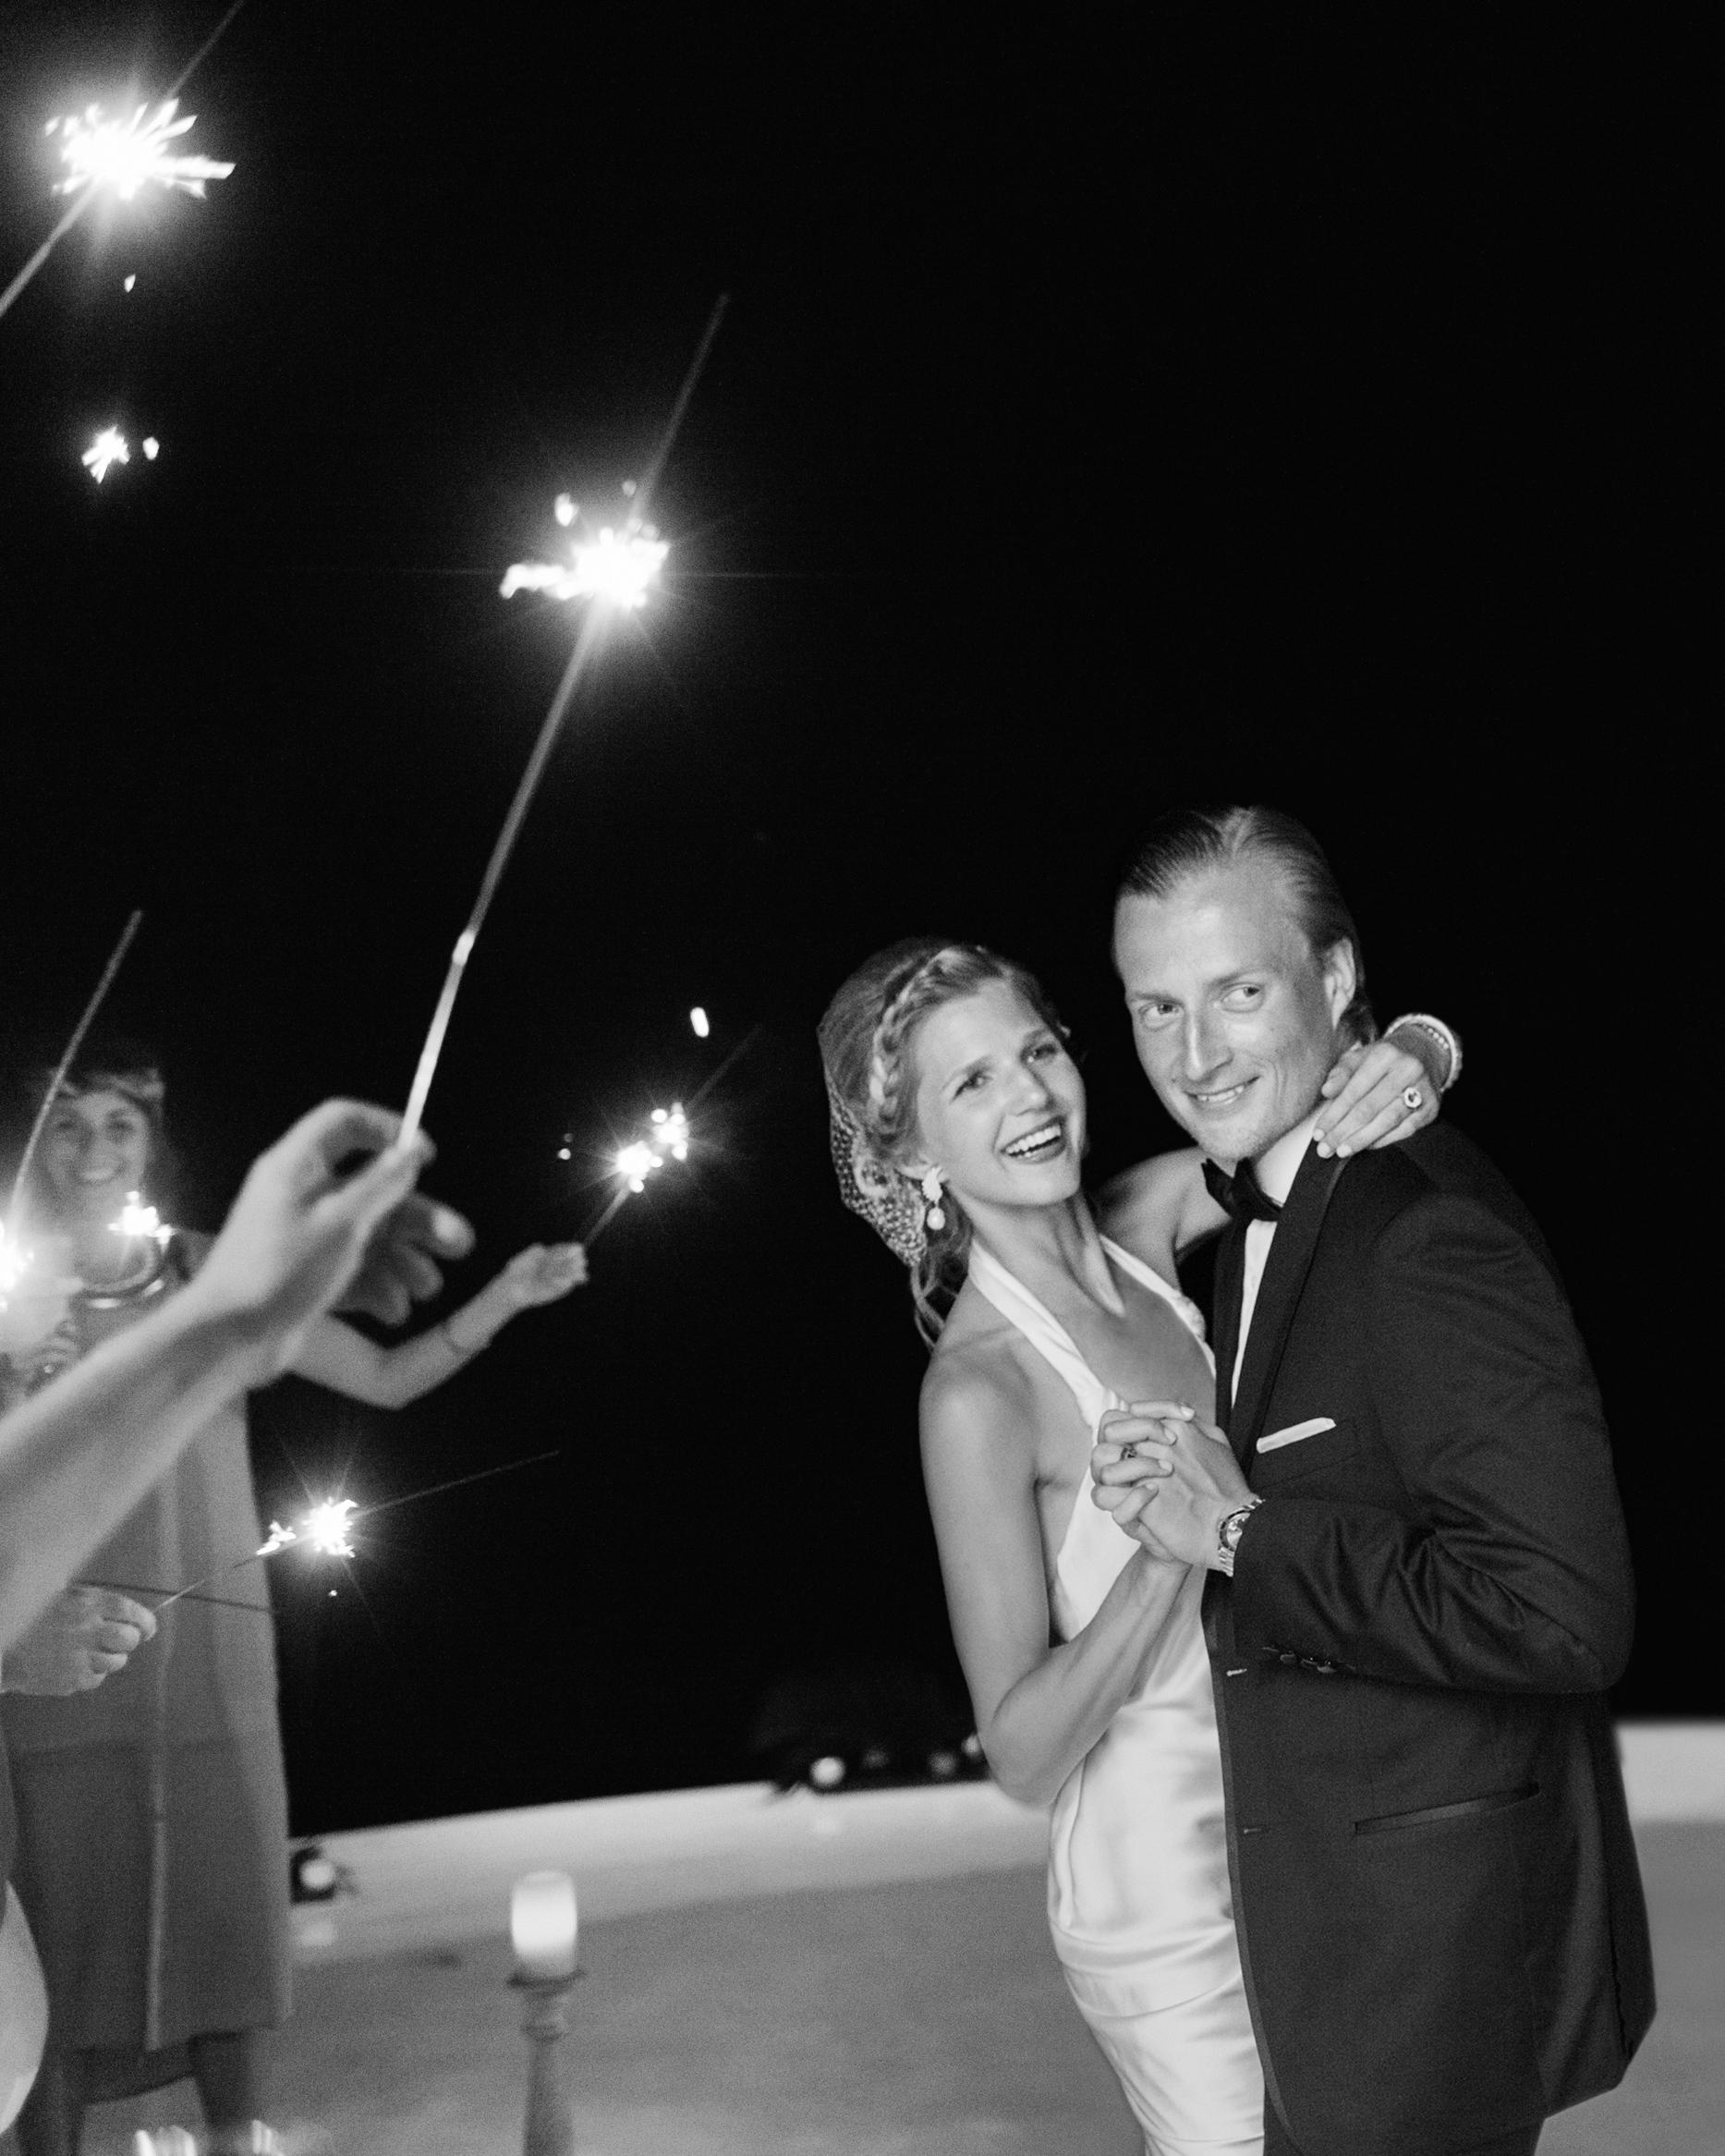 sparklers-brideandgroom-stjohnusvi-msw-4262-comp-mwds110805.jpg